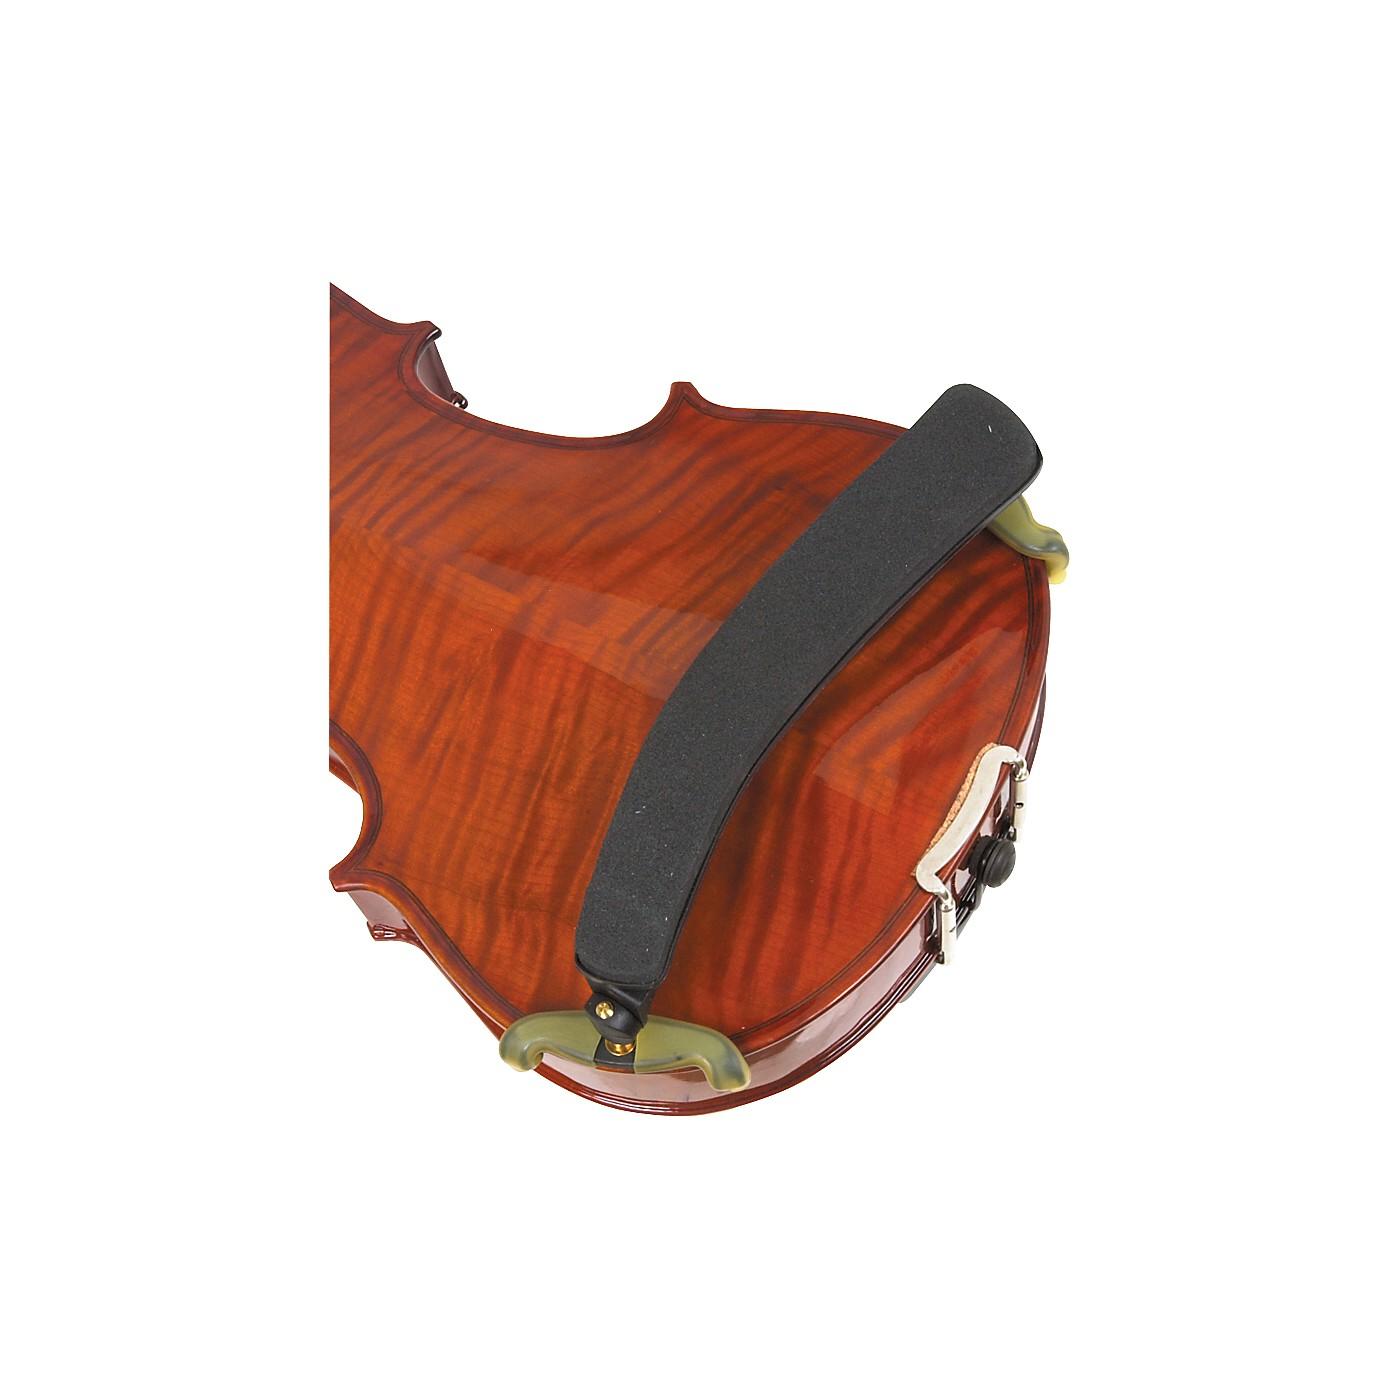 Kun ORIGINAL Violin Shoulder Rest thumbnail